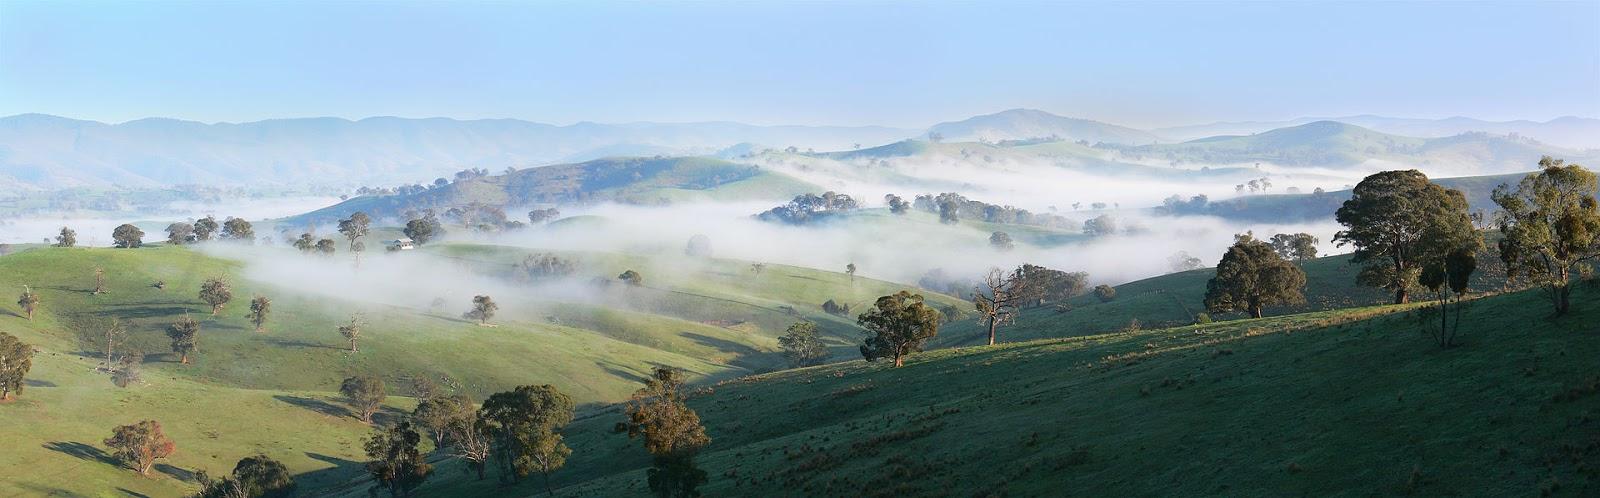 Разница между 'fogginess', 'fog', 'foggy', 'mistiness